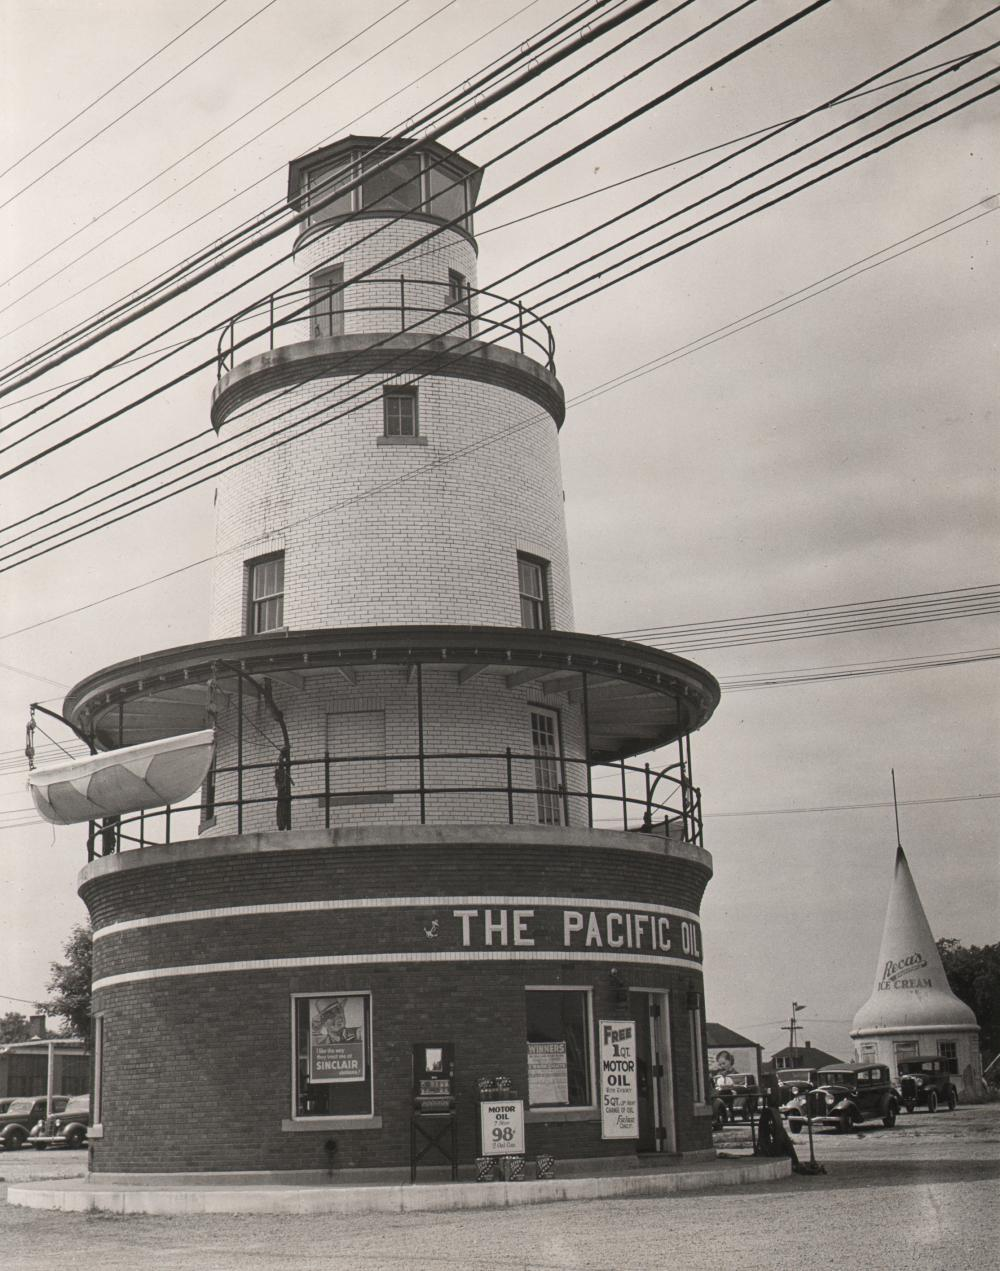 Eliot Elisofon, Roadside Diners, c. 1940